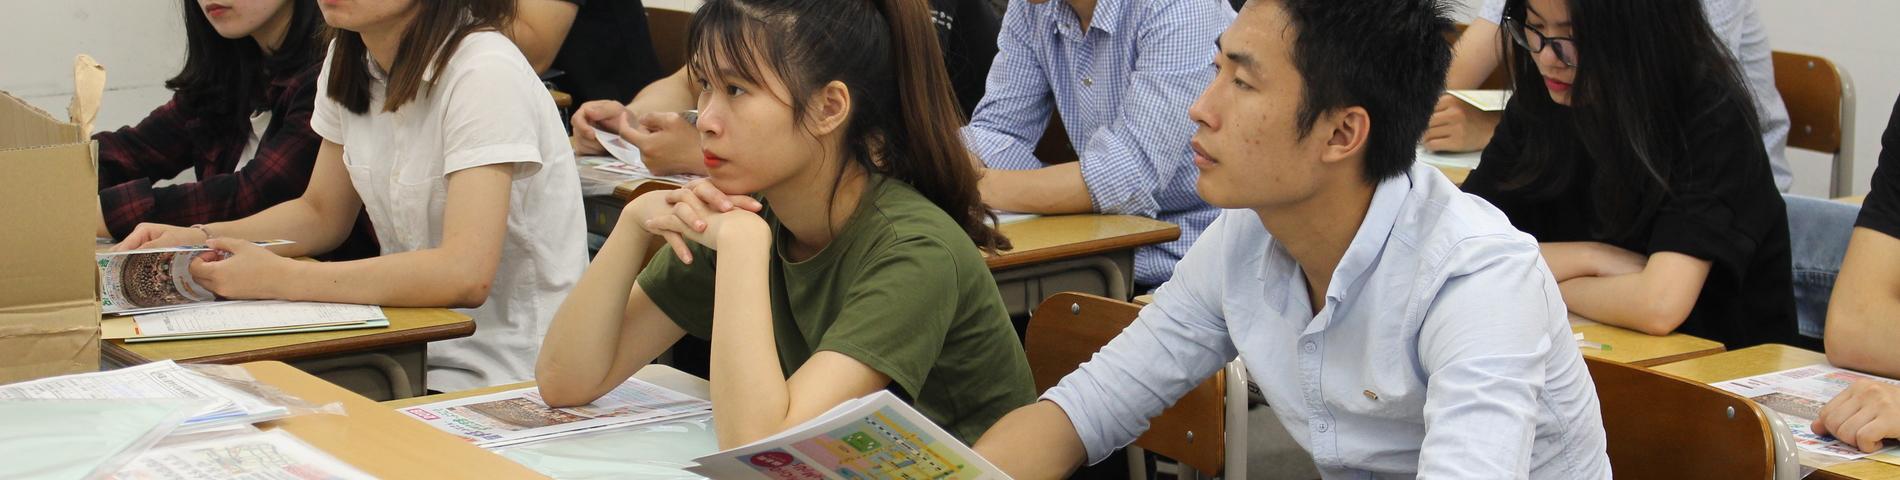 Shinwa Foreign Language Academy kuva 1